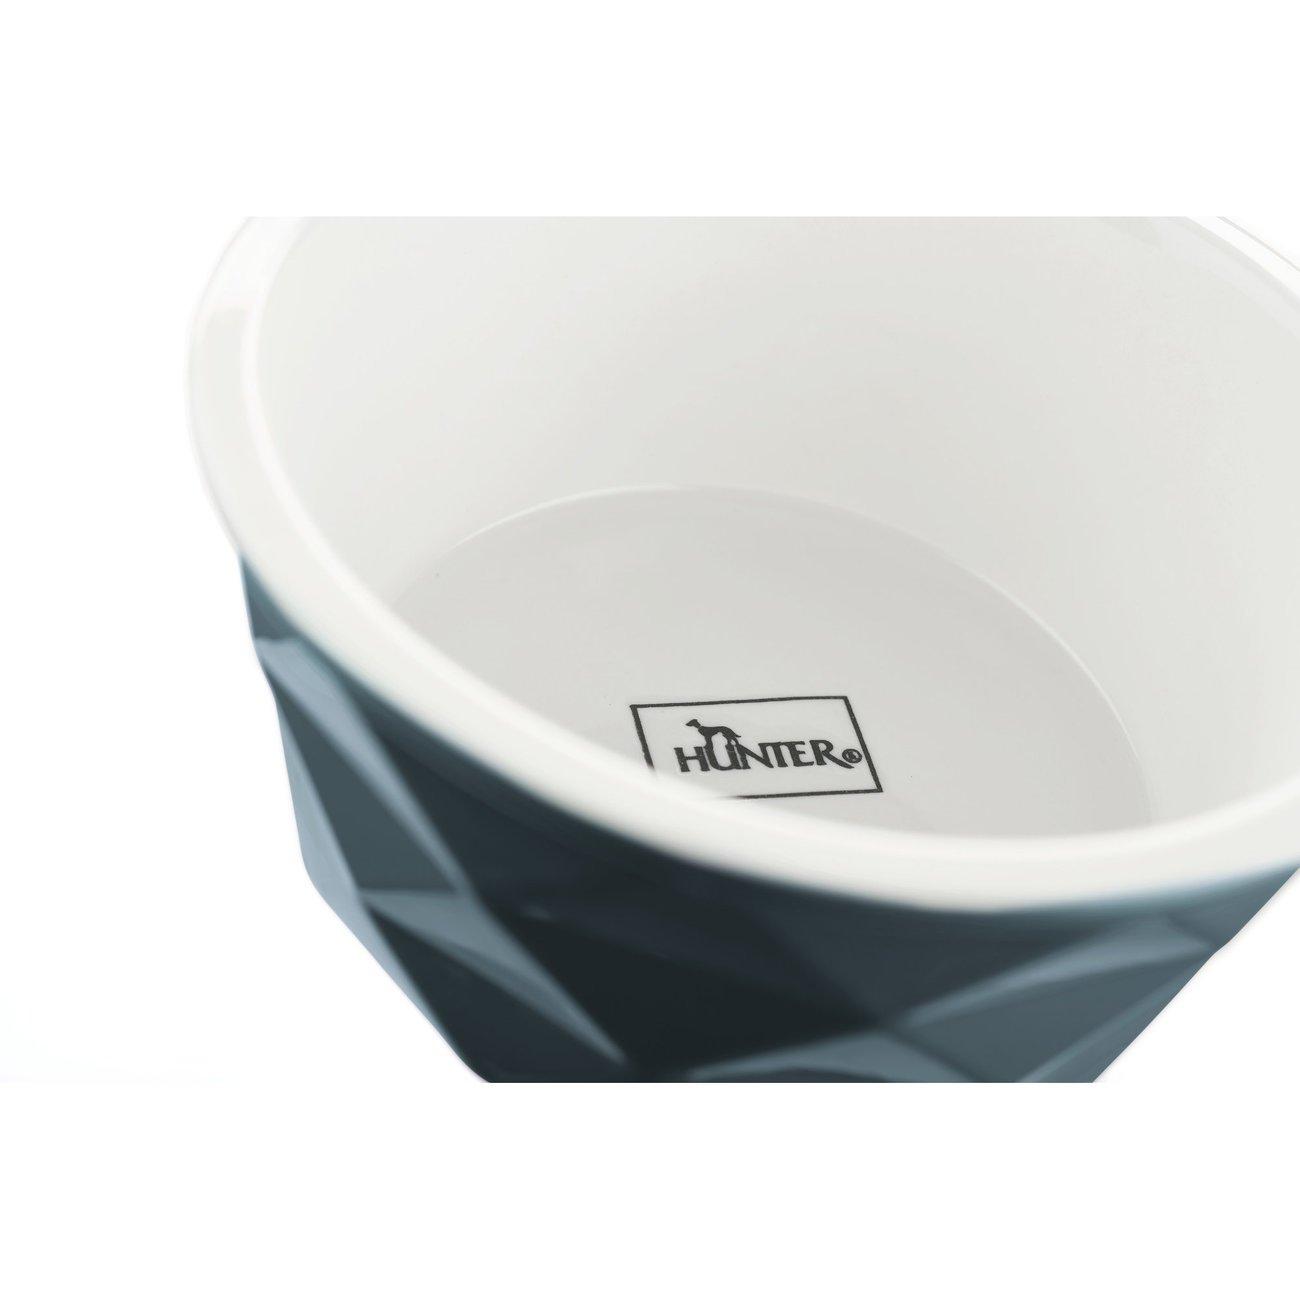 Hunter Keramik Napf Eiby 68648, Bild 10